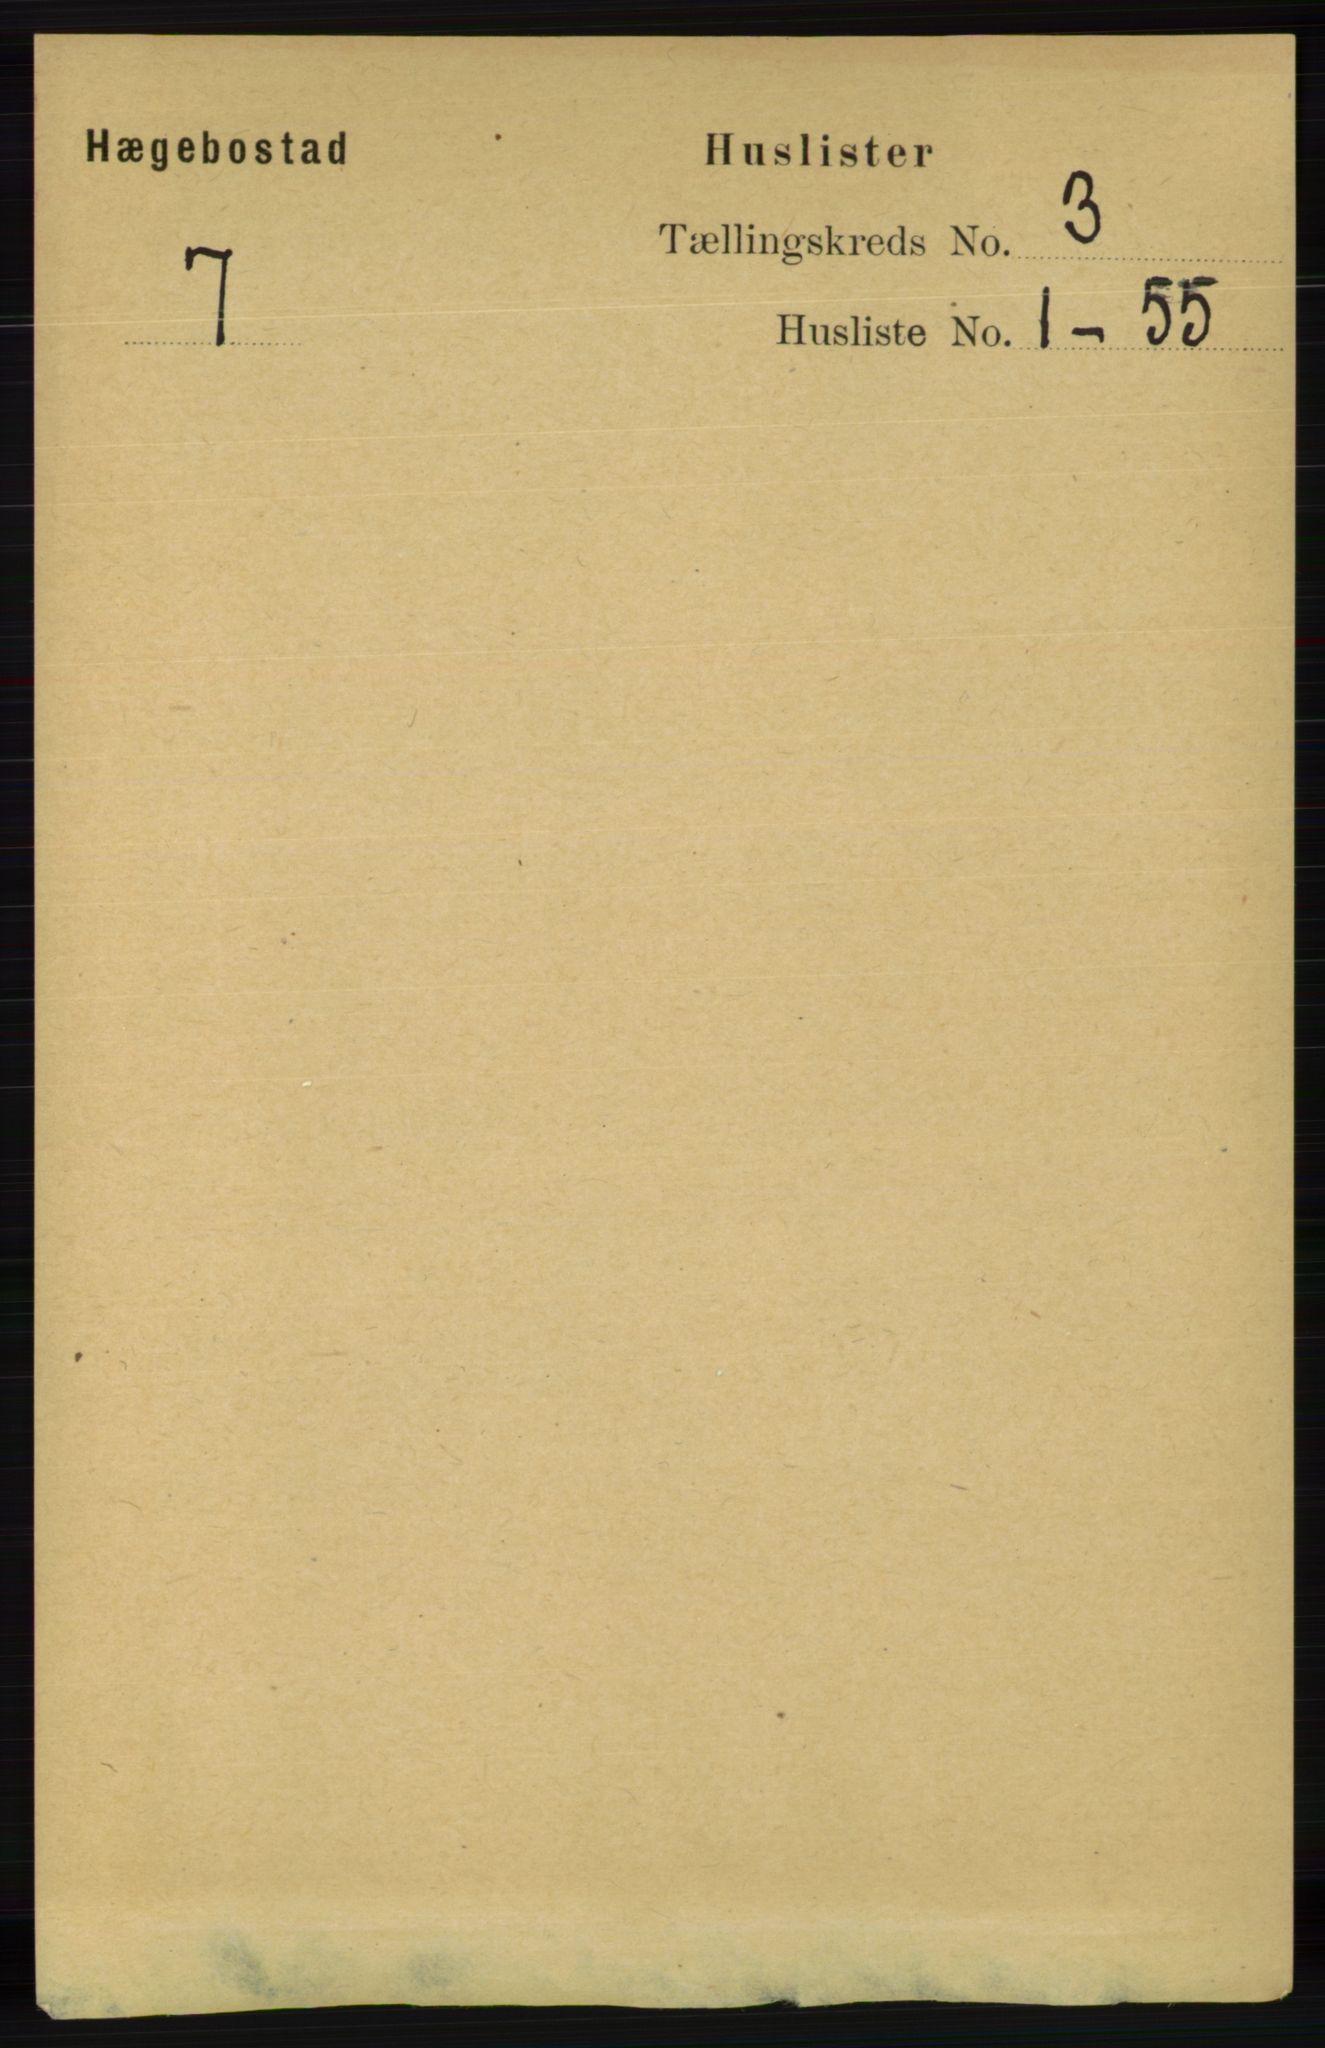 RA, Folketelling 1891 for 1034 Hægebostad herred, 1891, s. 814